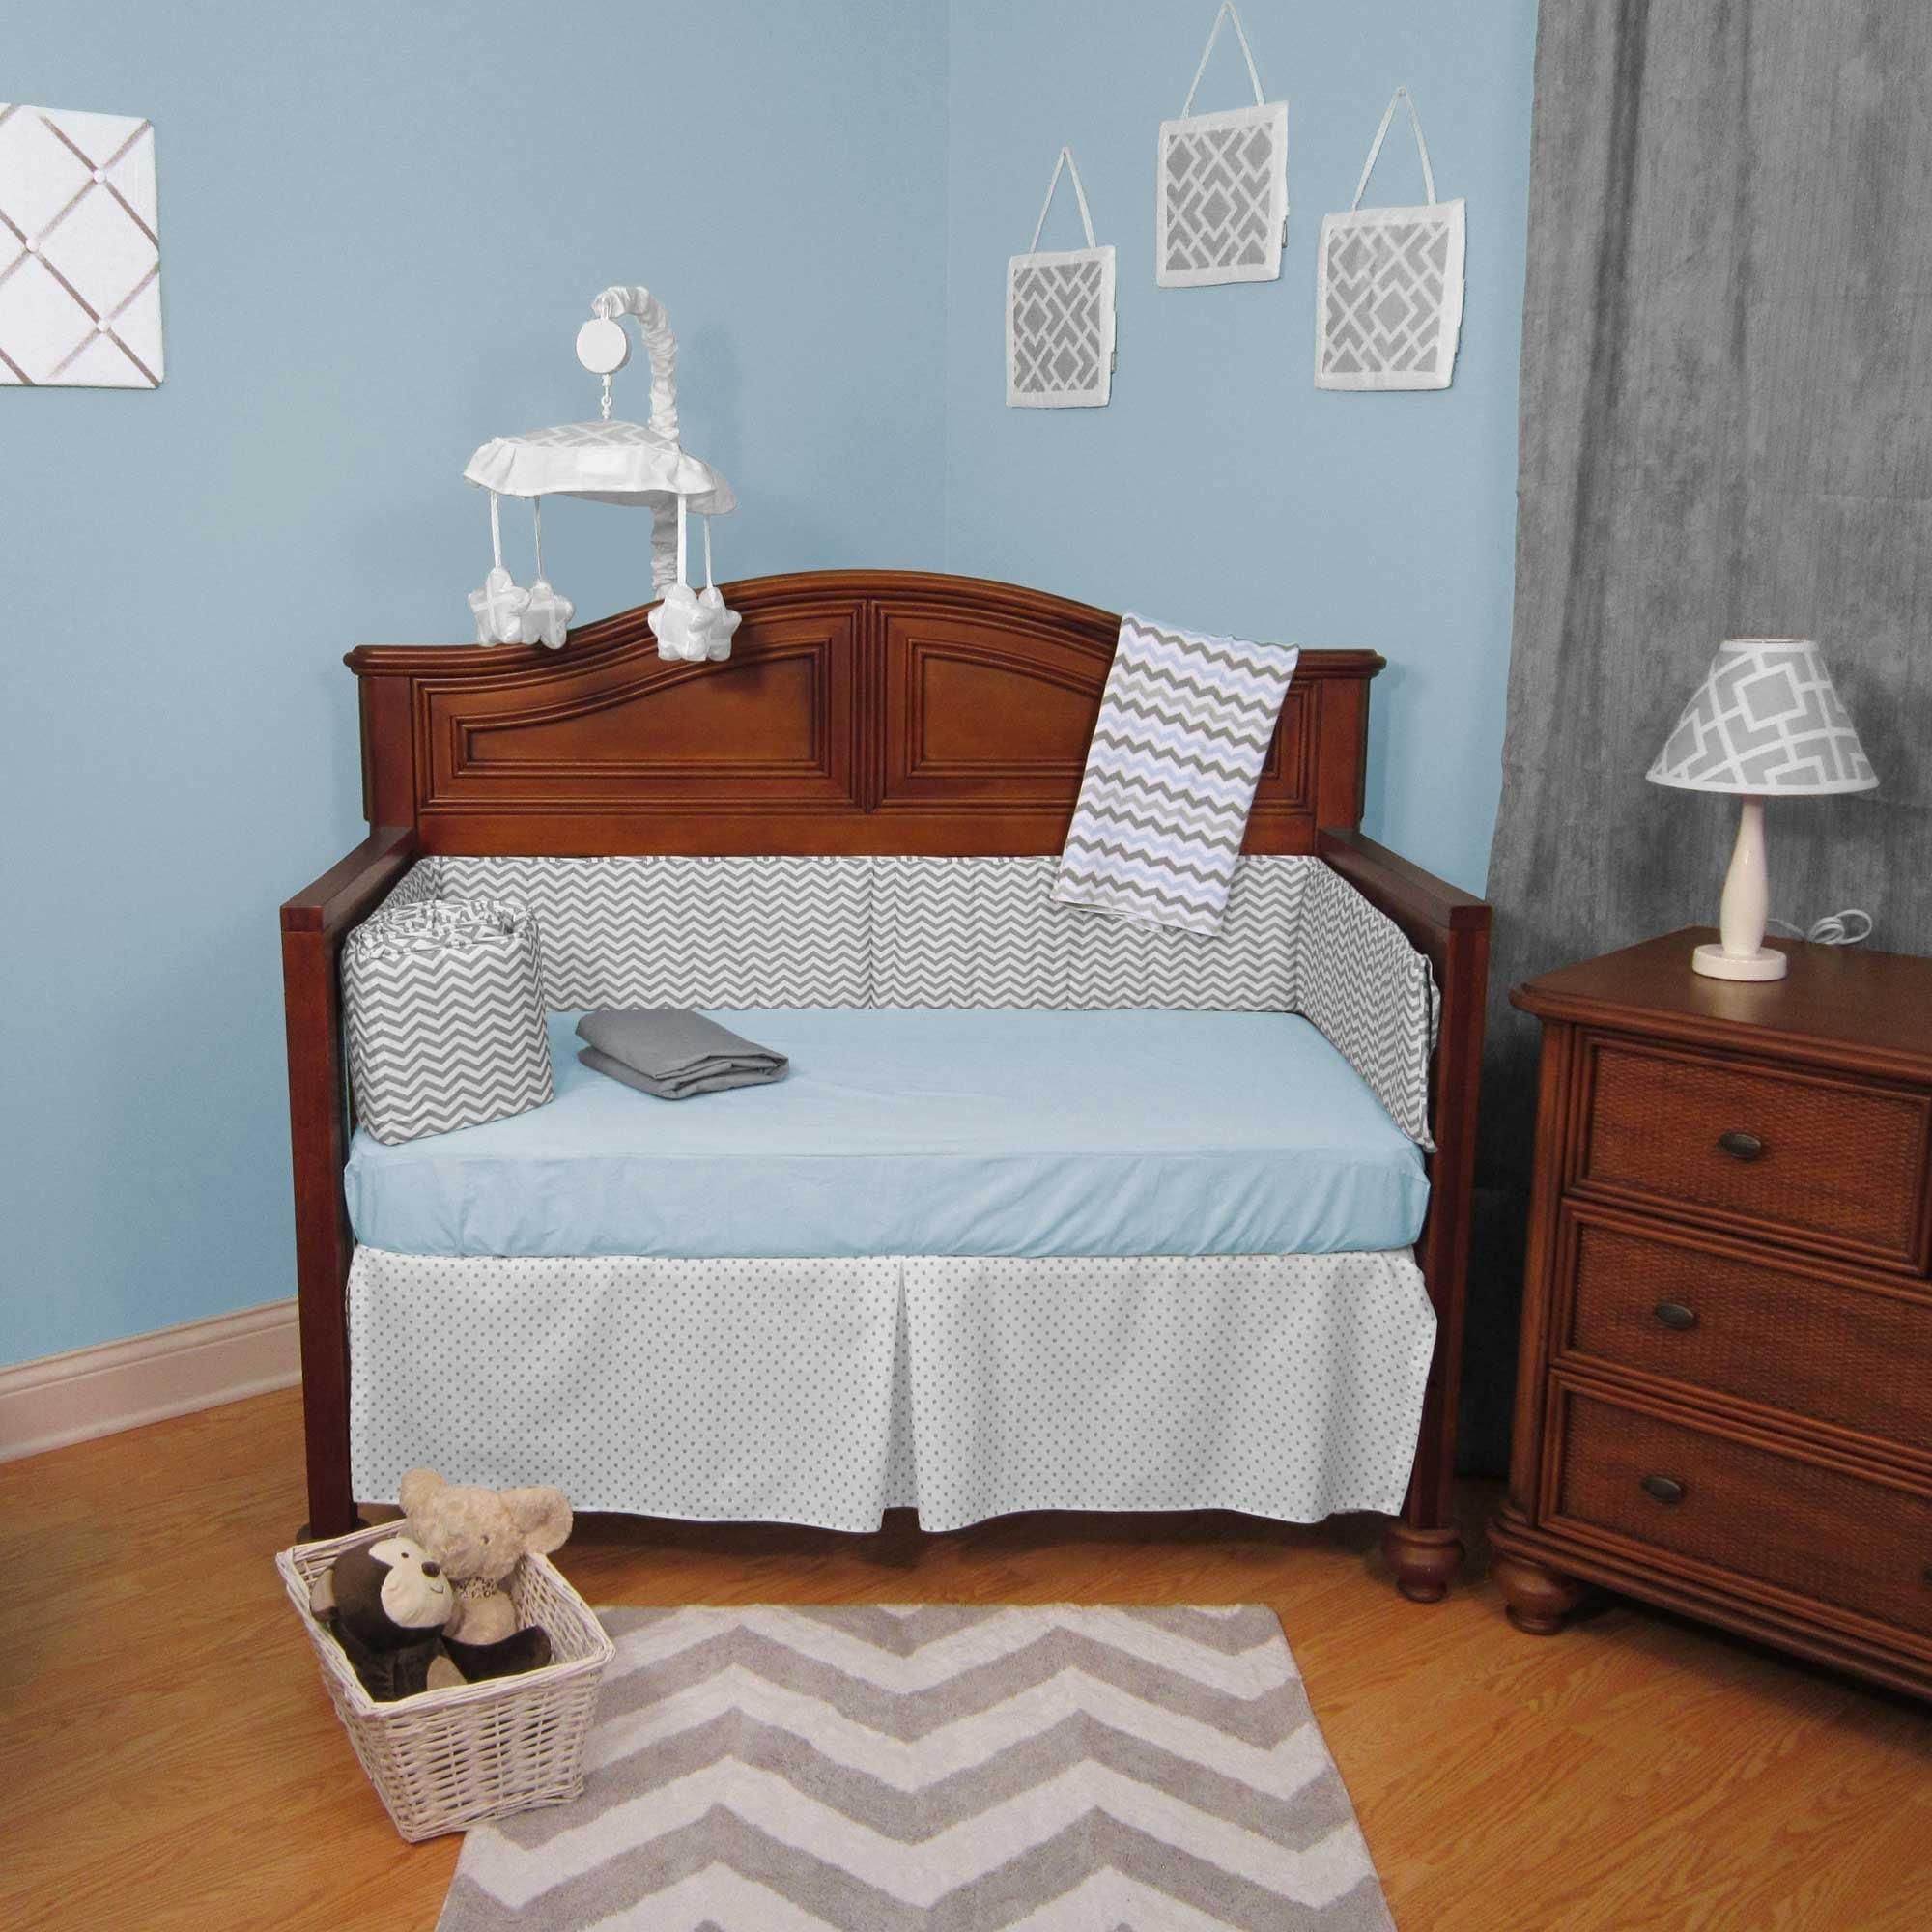 AMERICAN BABY COMPANY (ABC) Chevron Zig Zag Blue/Grey wit...